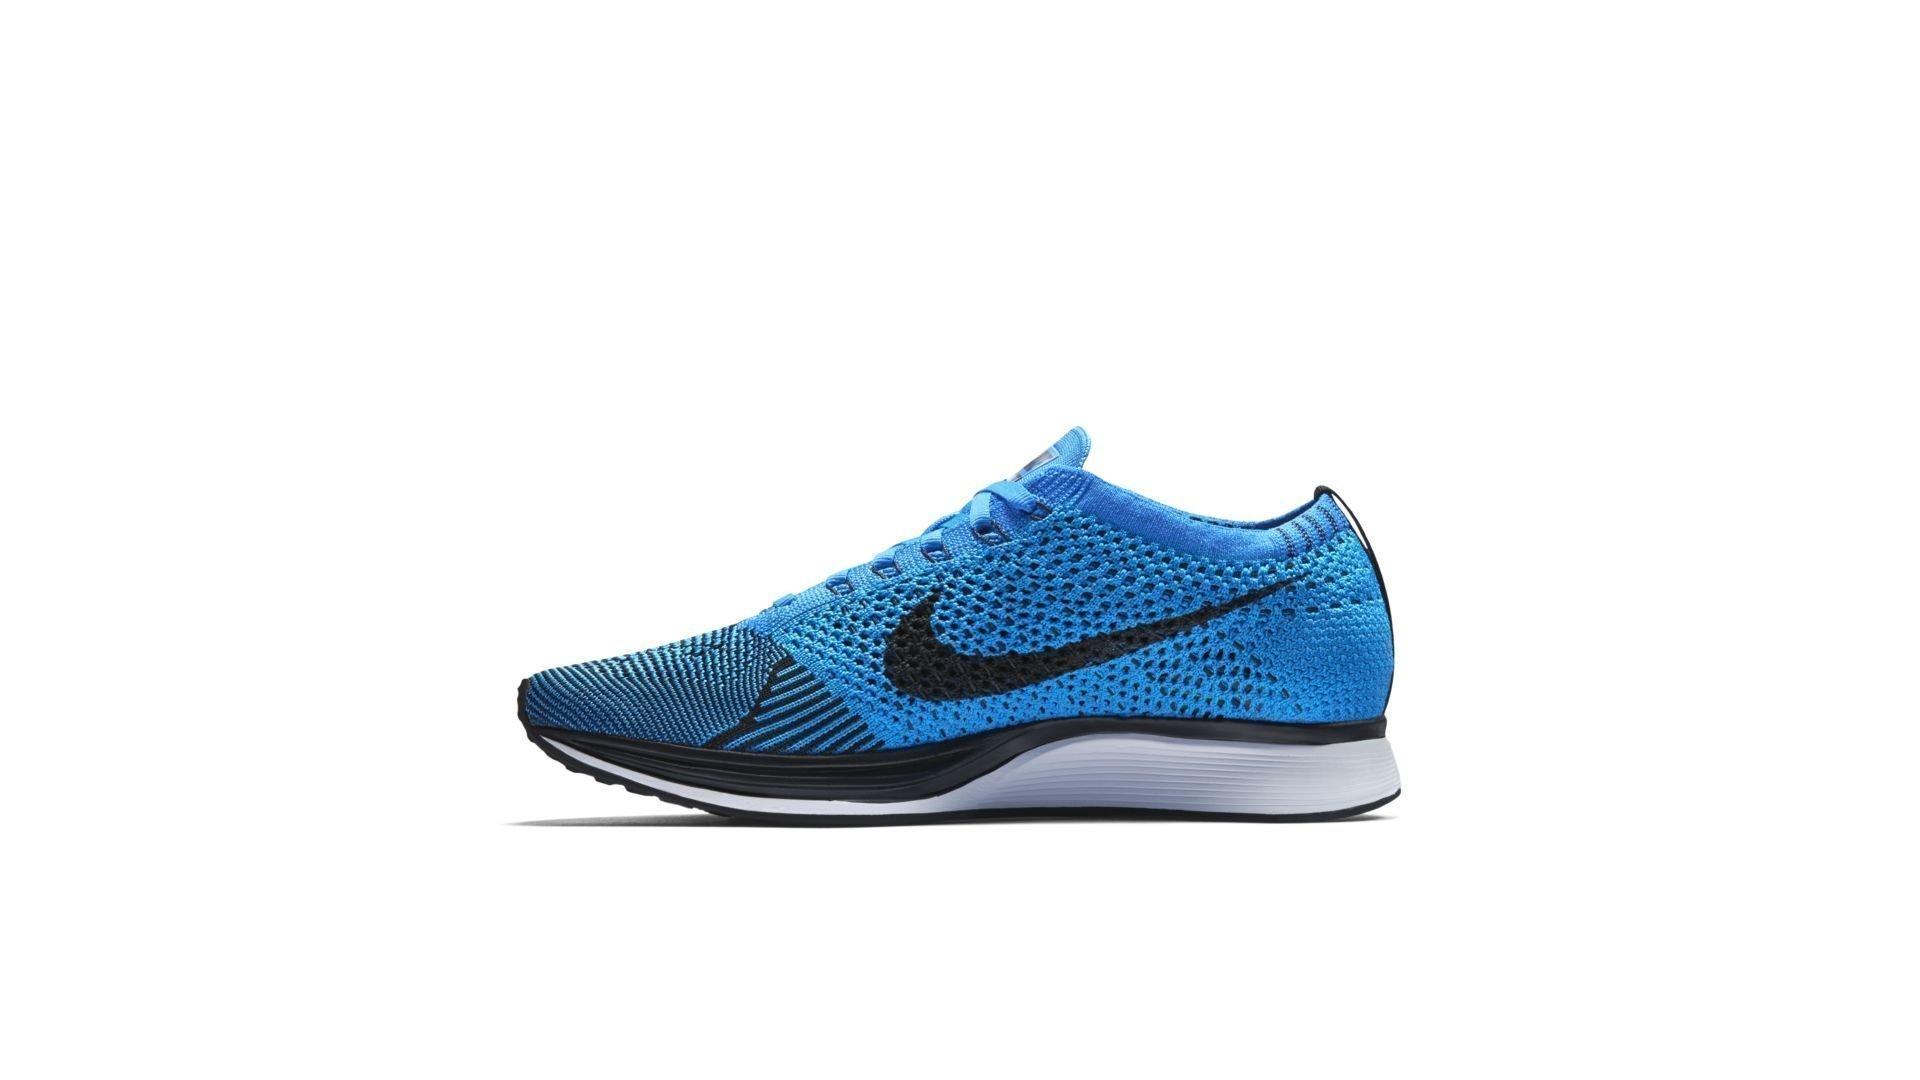 Nike Flyknit Racer Black Photo Blue (526628-001)